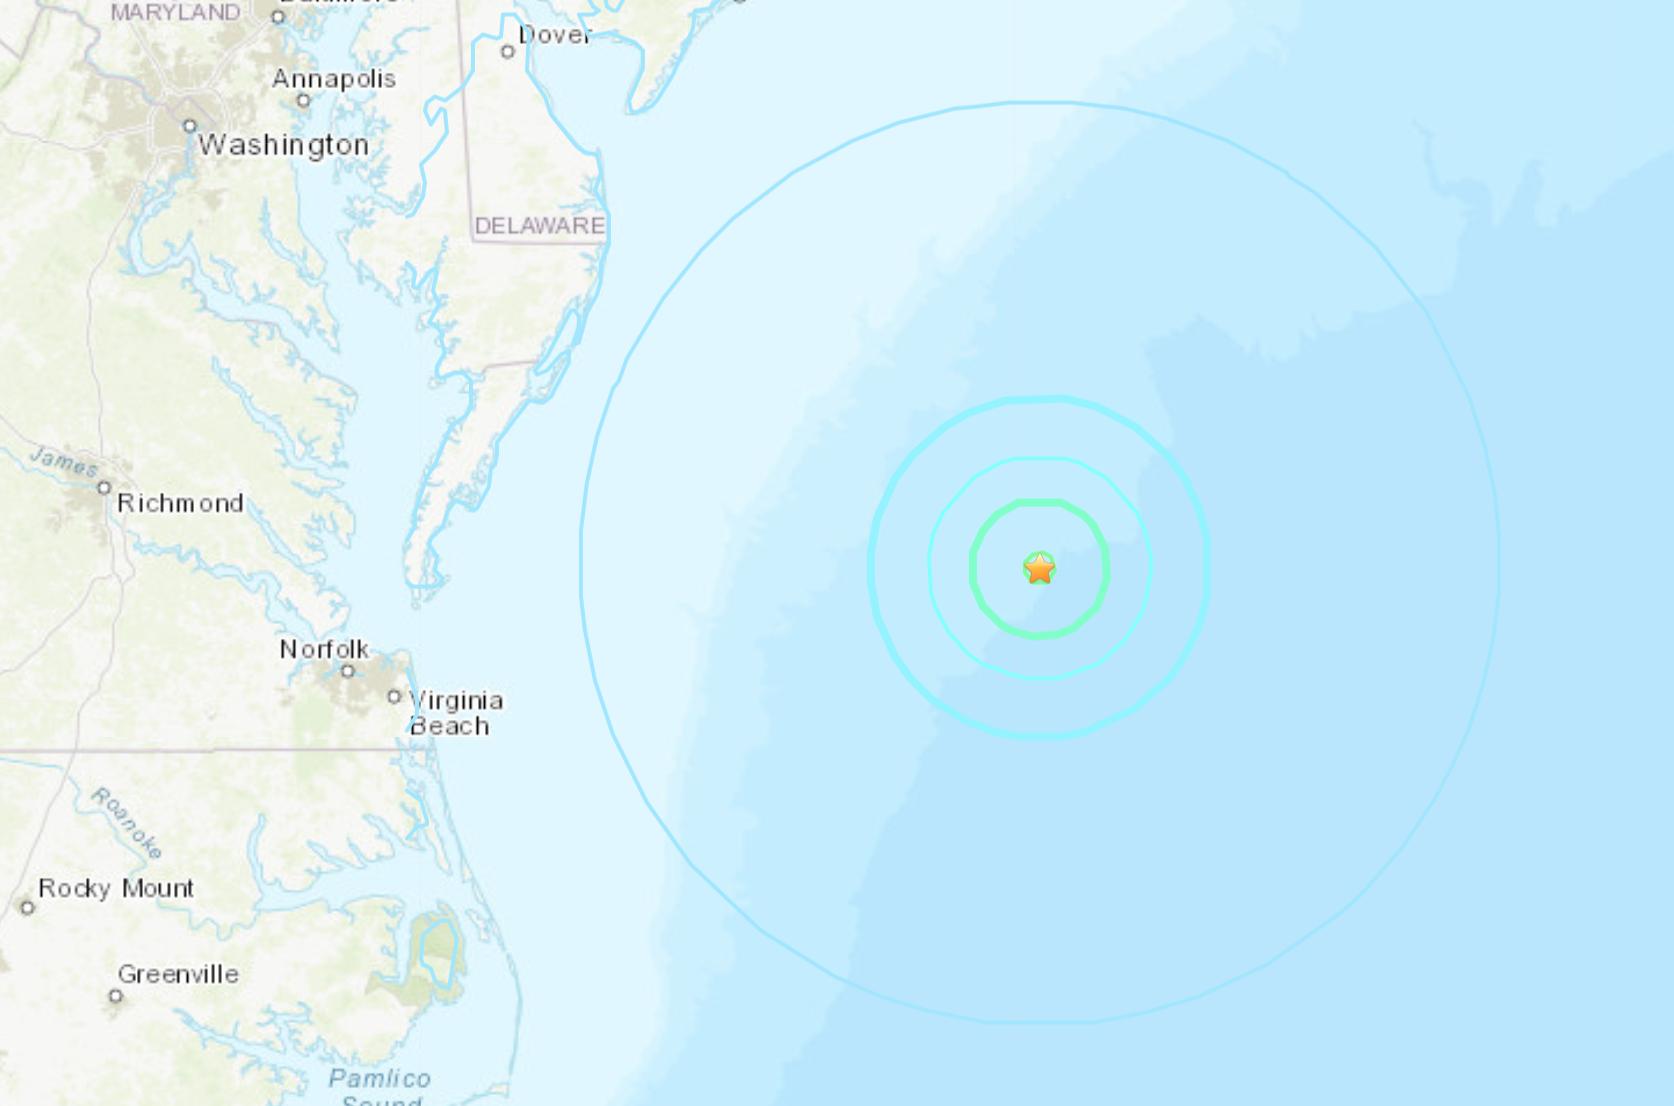 4 7 Magnitude Earthquake Reported Off Coast Of Ocean City